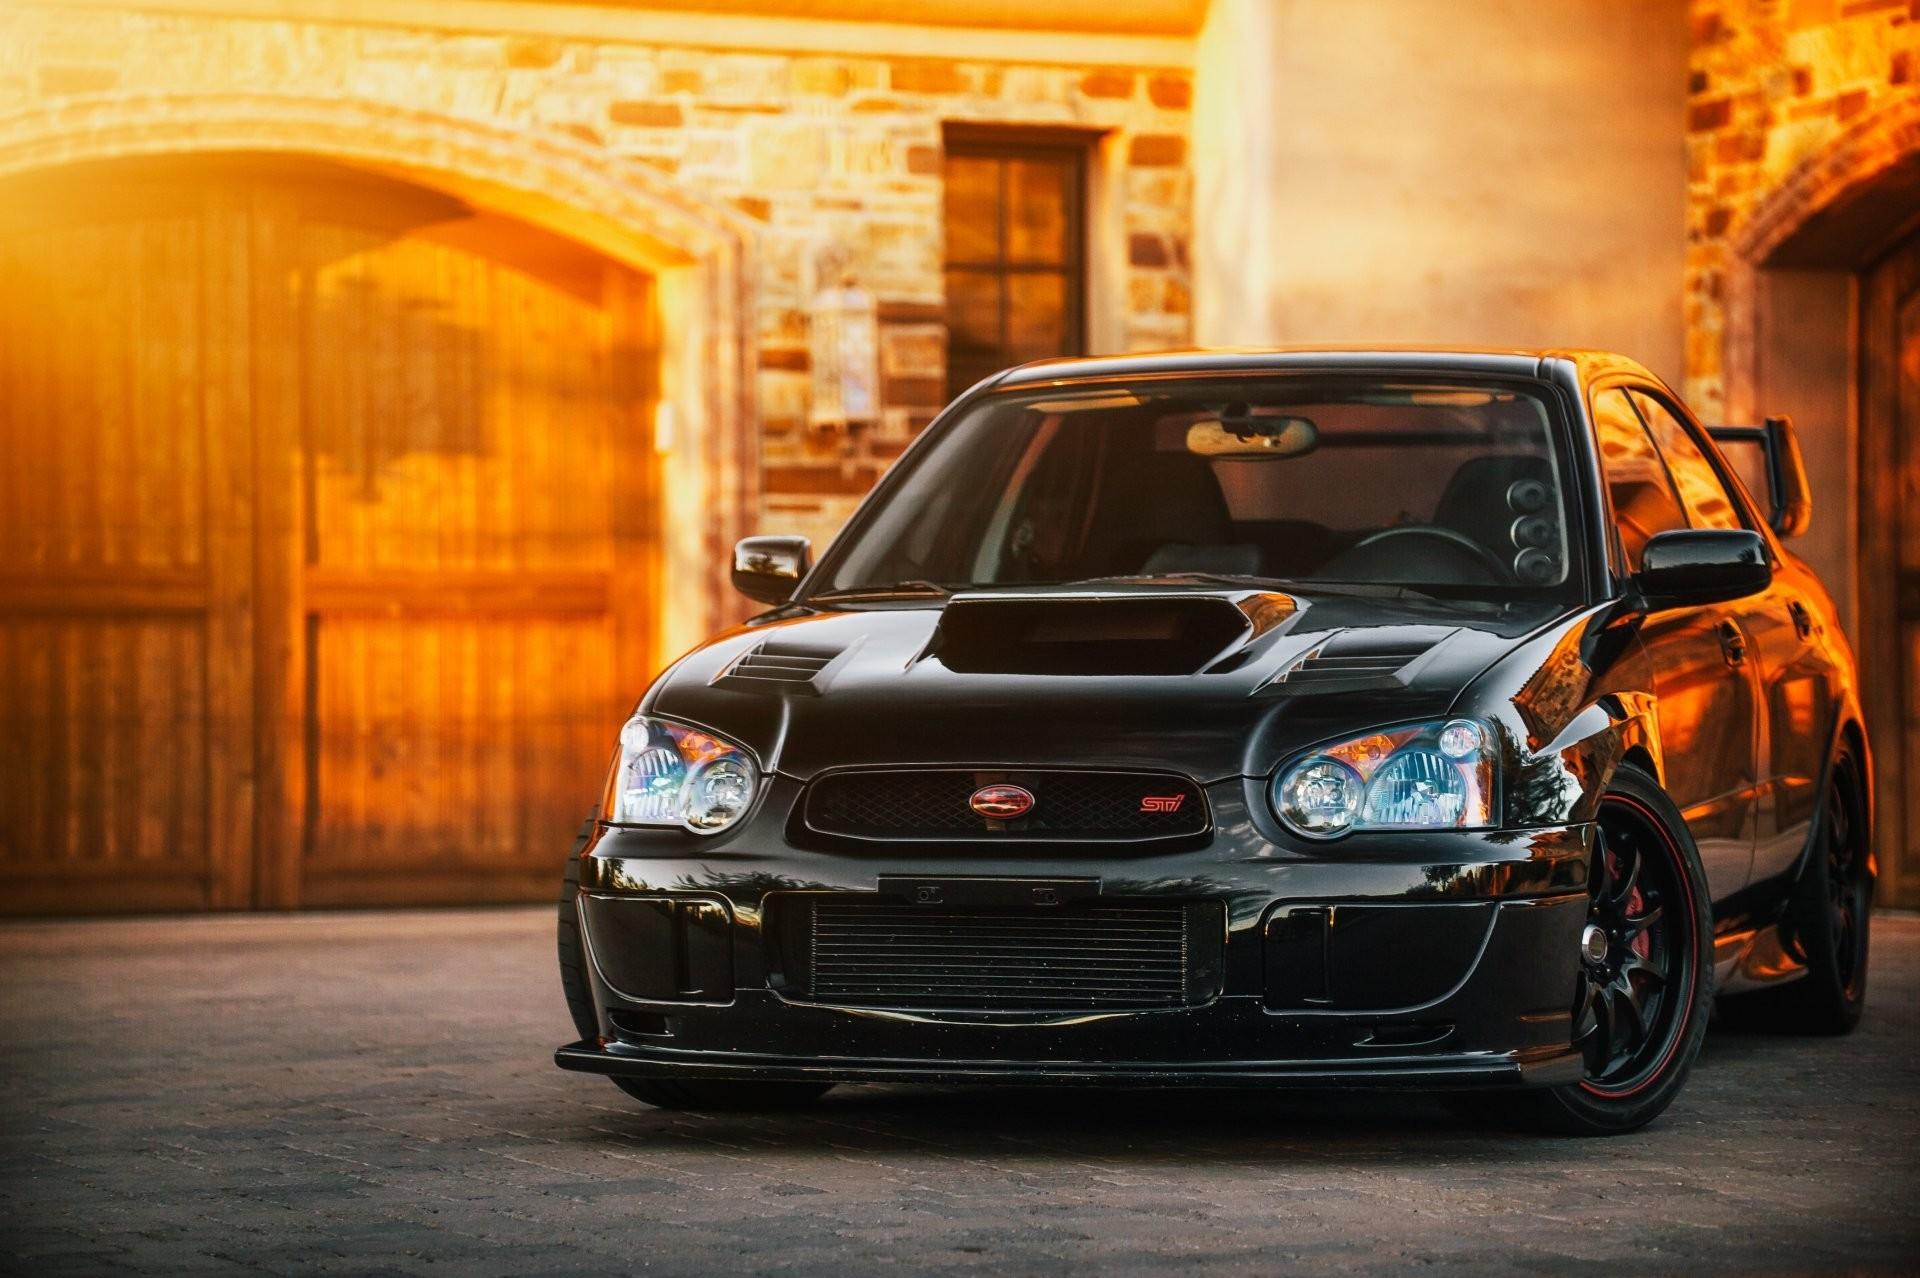 Subaru Impreza Wrx Sti Wallpaper ·①